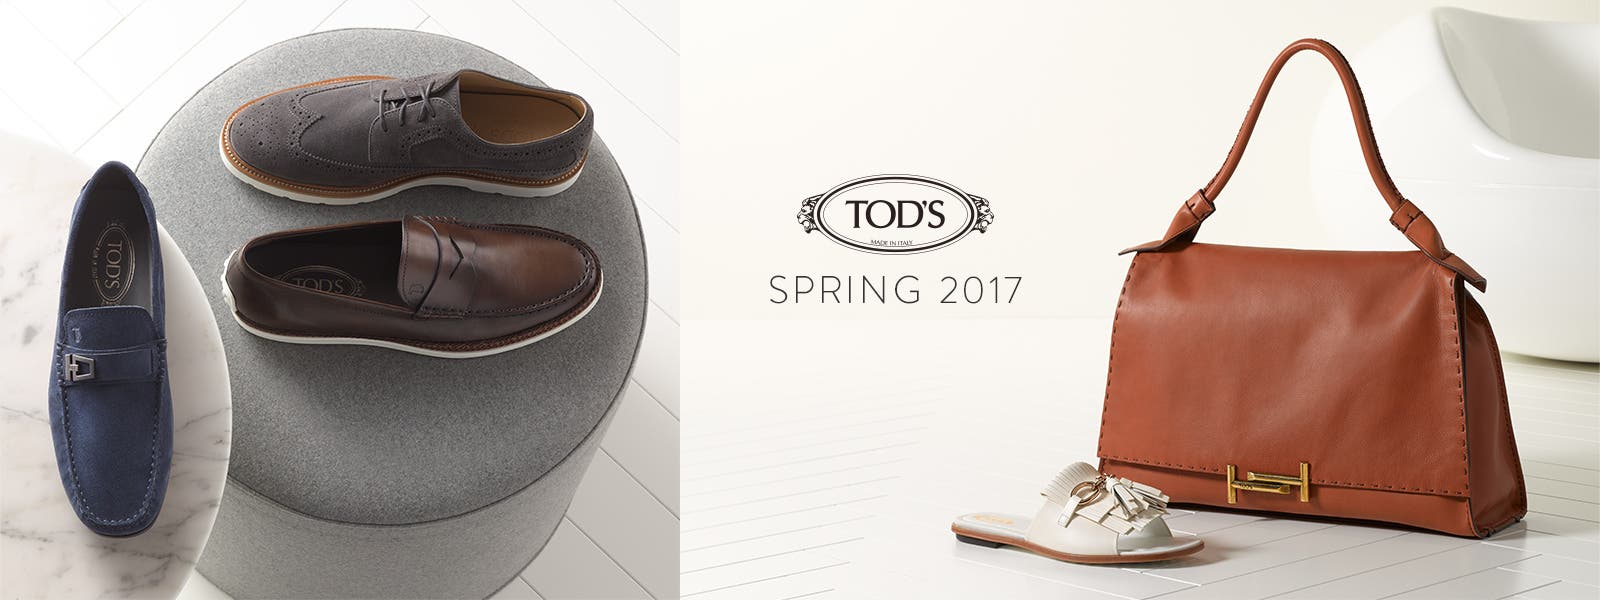 Tod's spring 2017.